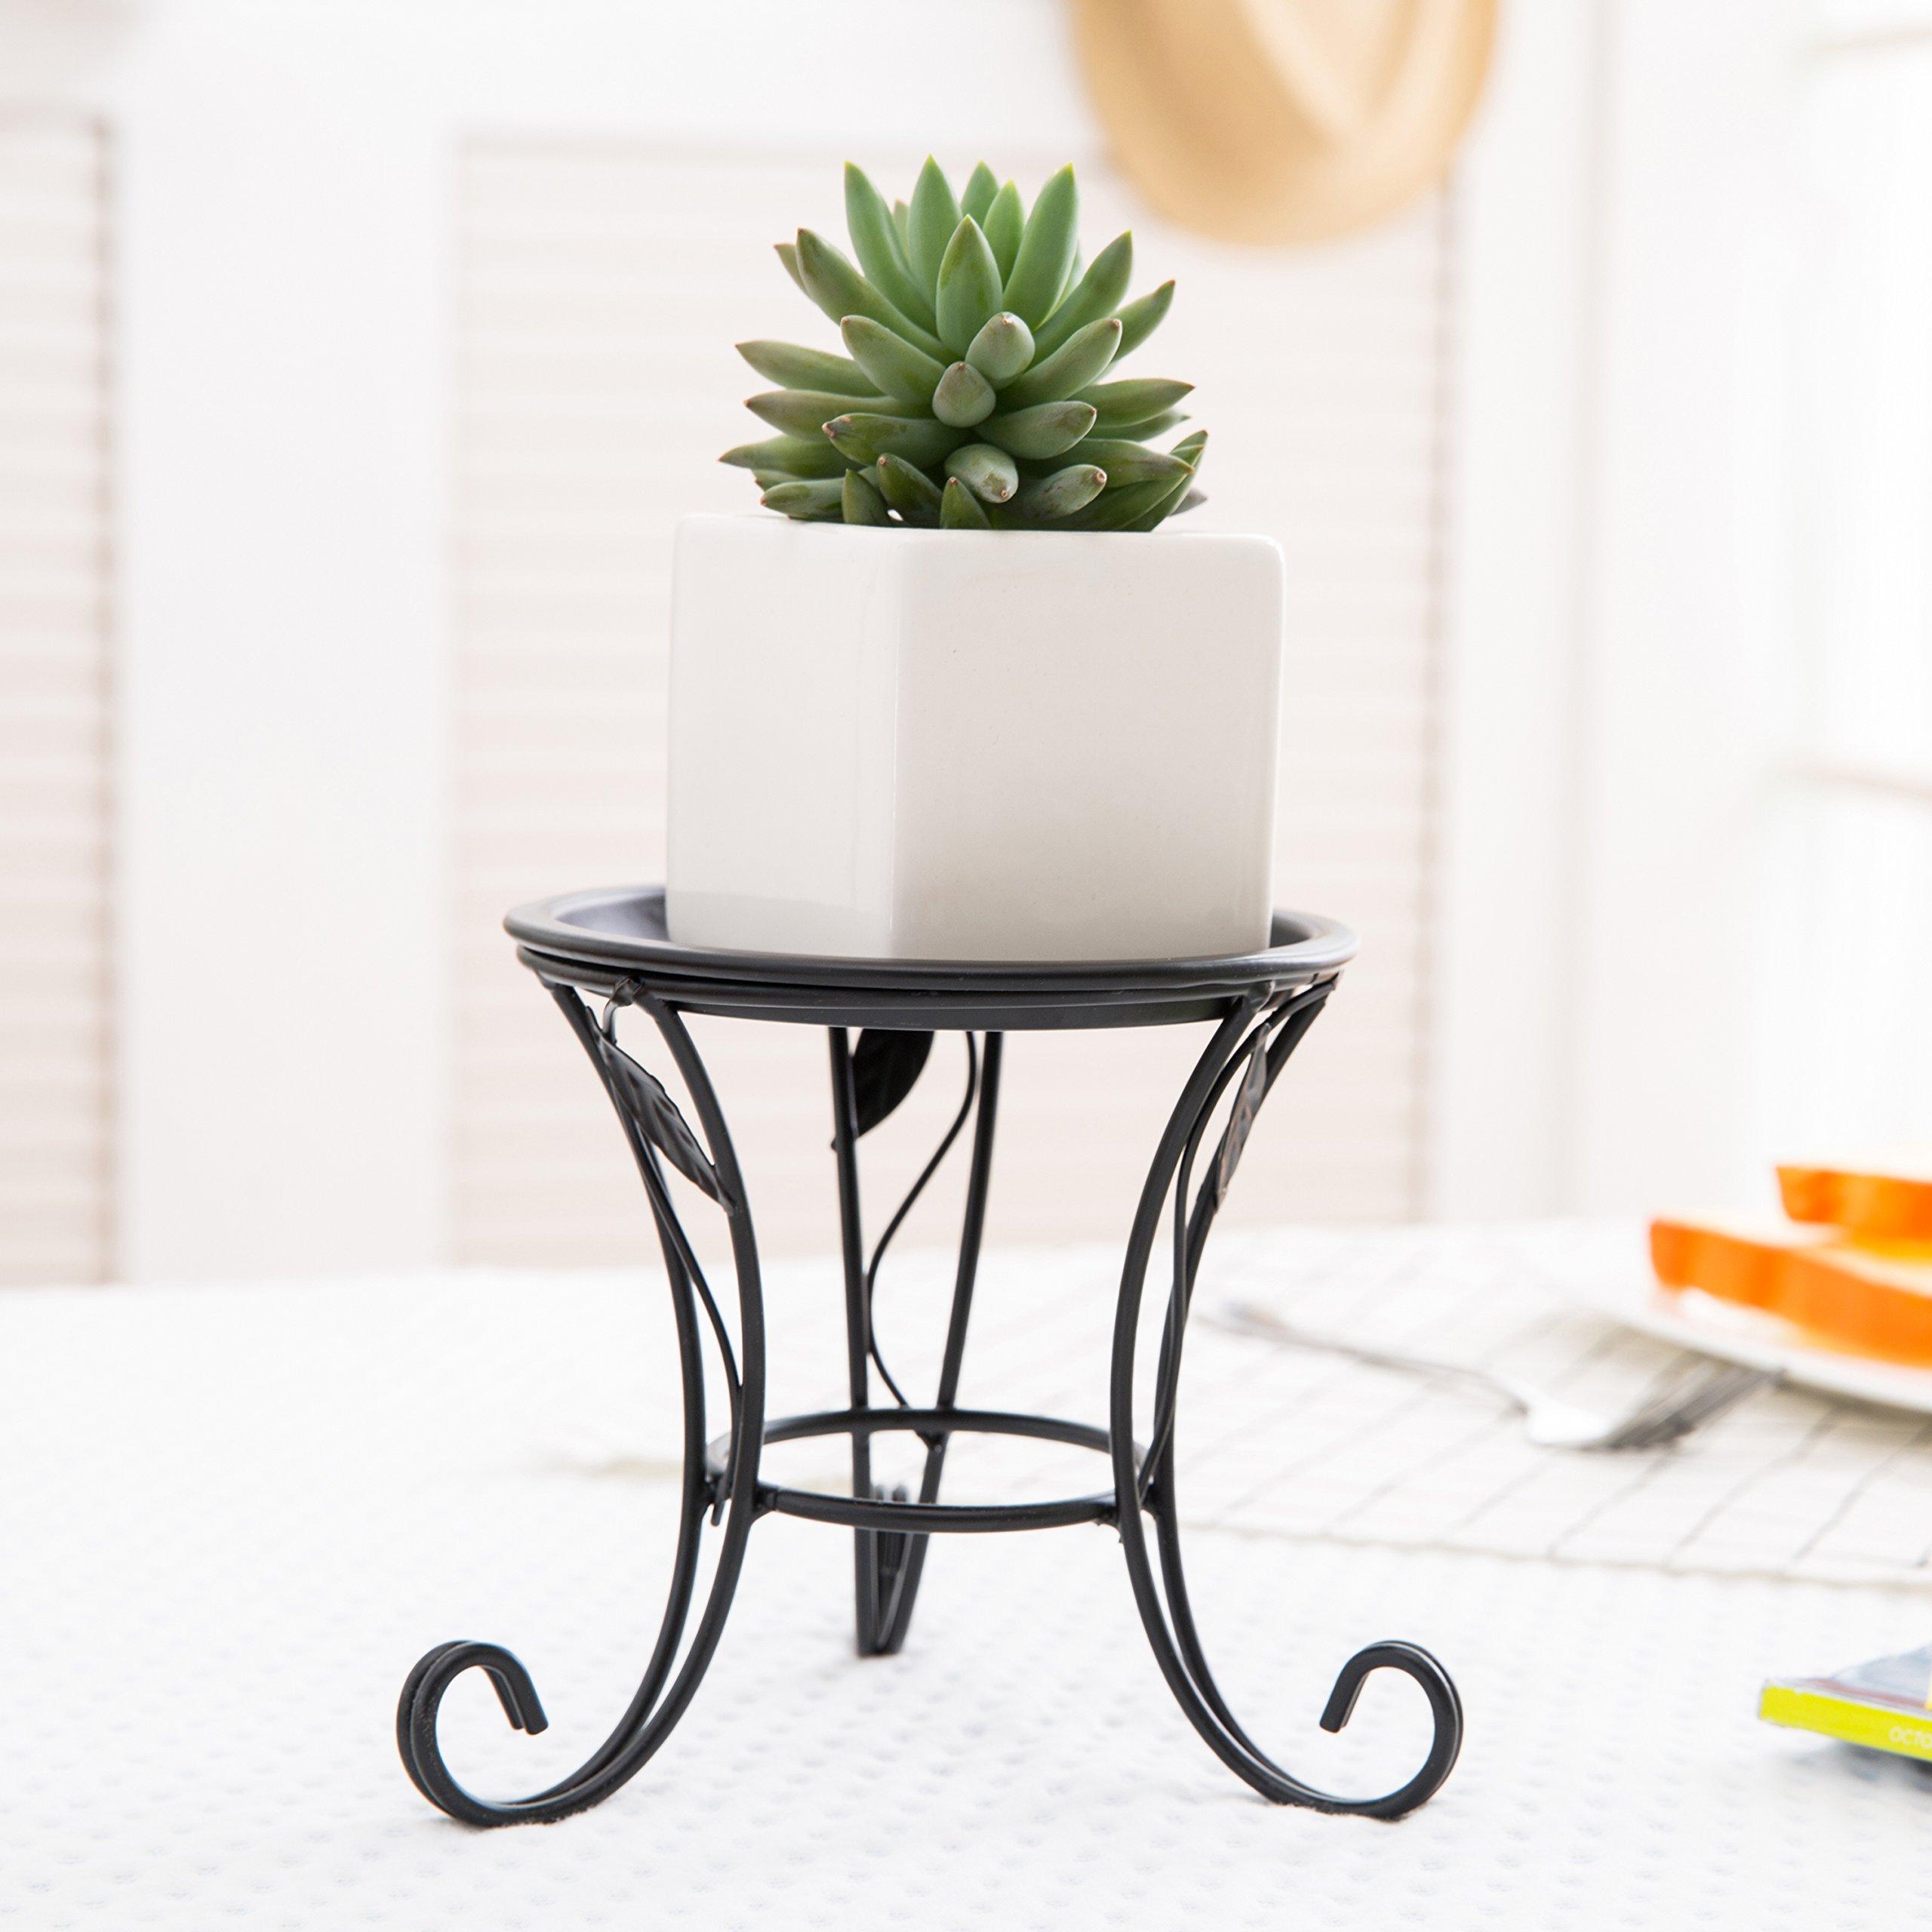 5-Inch Black Iron Scrollwork Design Desktop Plant Stand, Tabletop Pillar Candleholder by MyGift